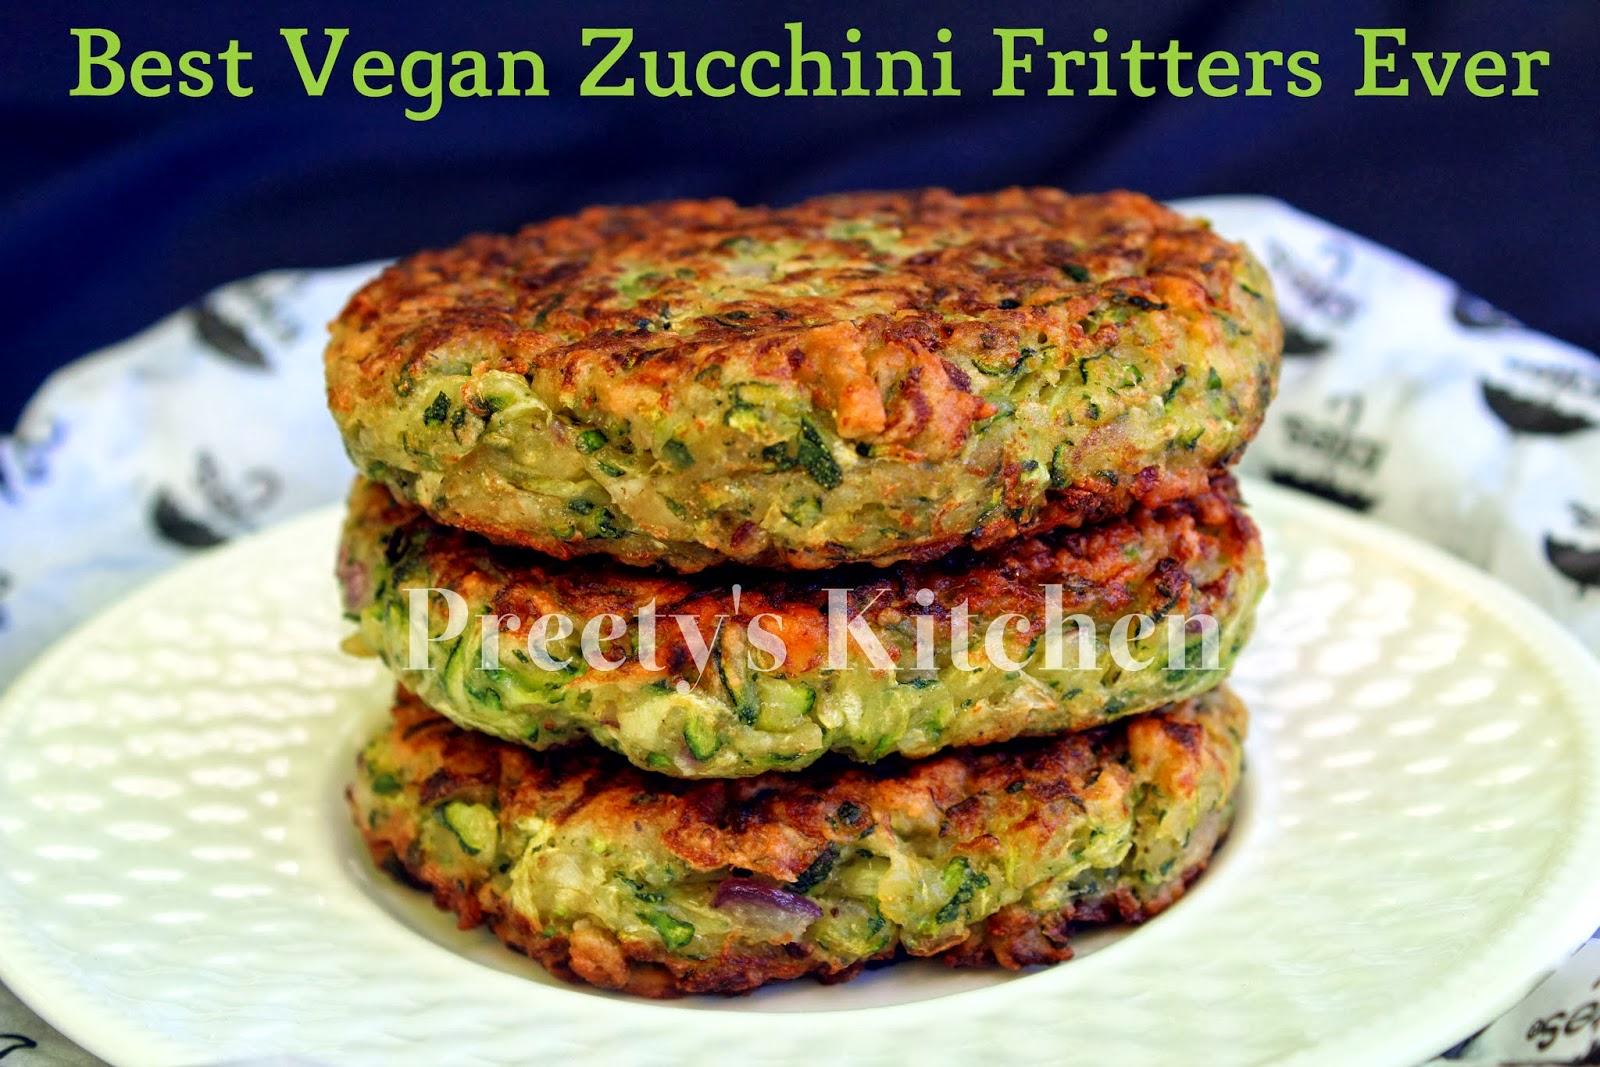 Preetys kitchen best vegan zucchini fritters ever forumfinder Choice Image